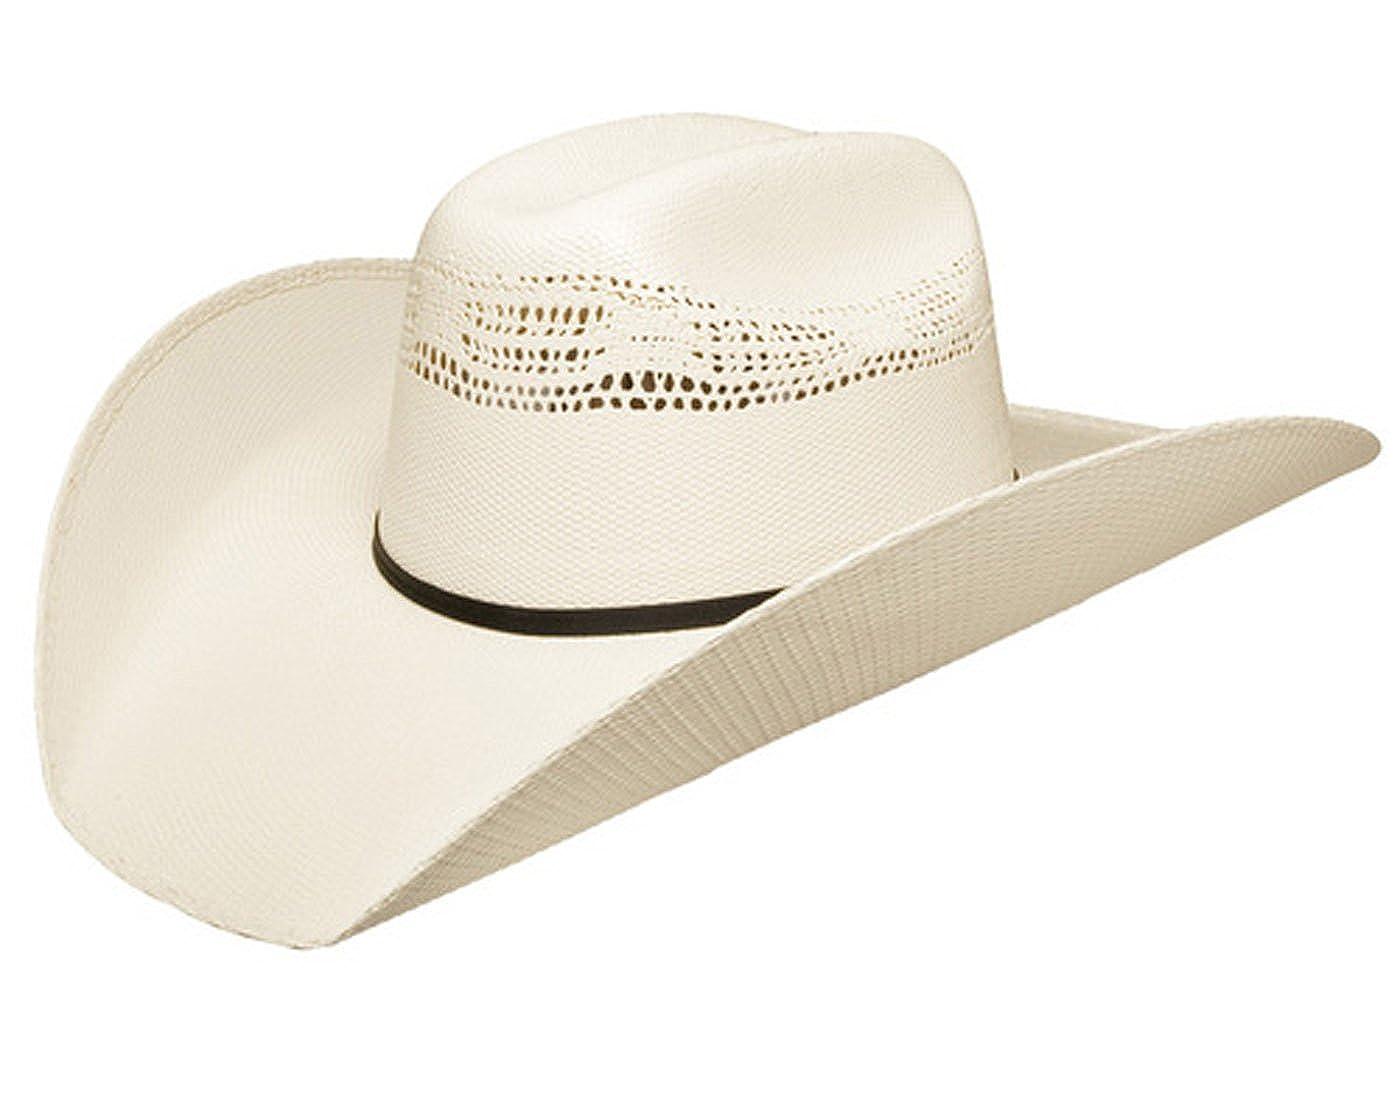 Resistol Mens 7X Ringer Straw Cowboy Hat Small Medium Natural at Amazon  Men s Clothing store  3e48c89d2a1